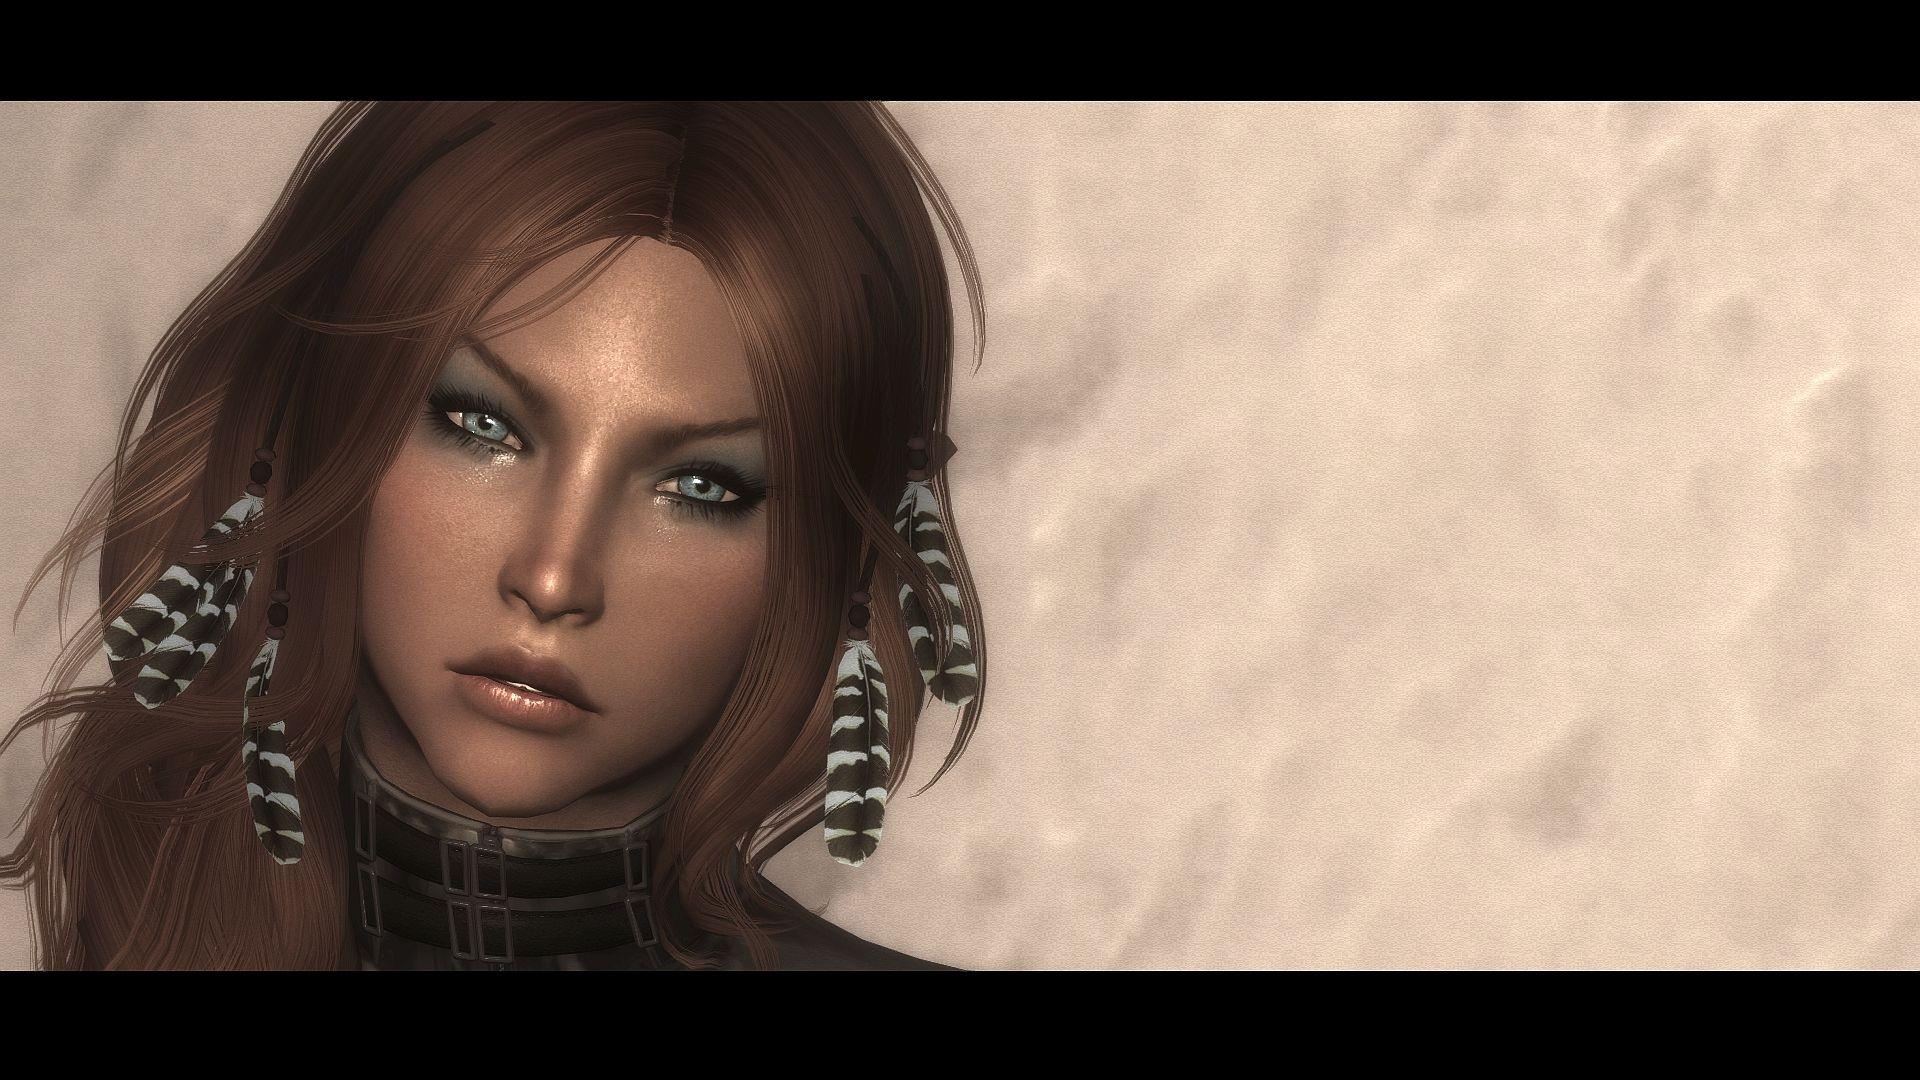 Danariel Stormbow Follower with Body Changer at Skyrim Nexus - mods